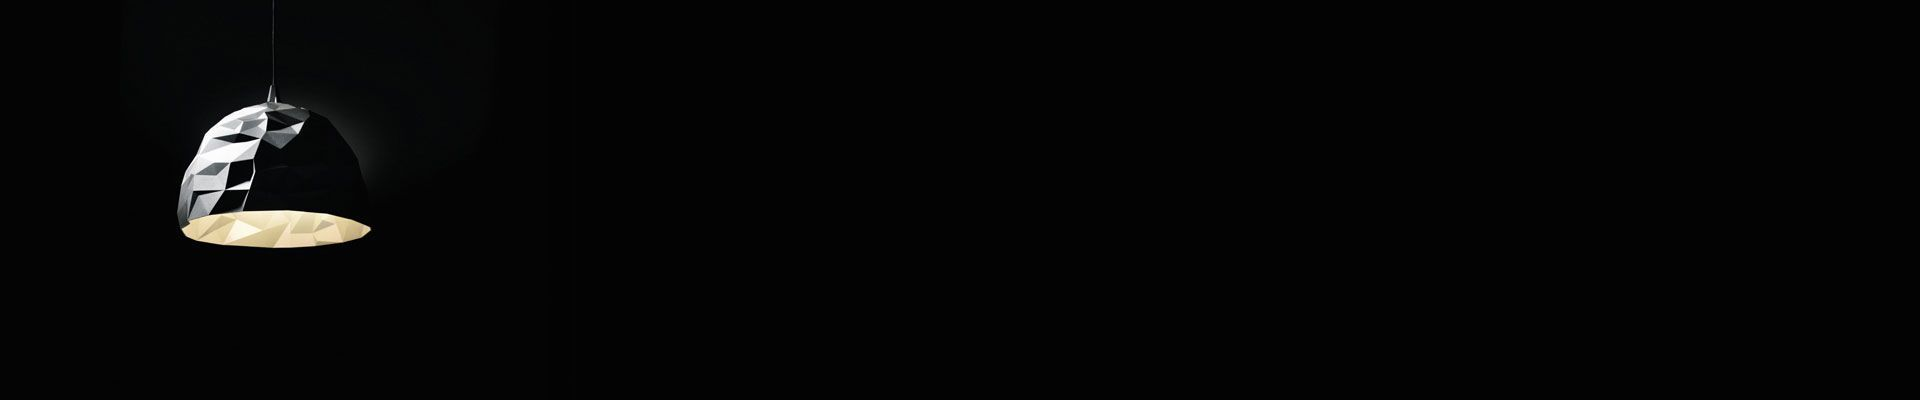 Diesel hanglampen